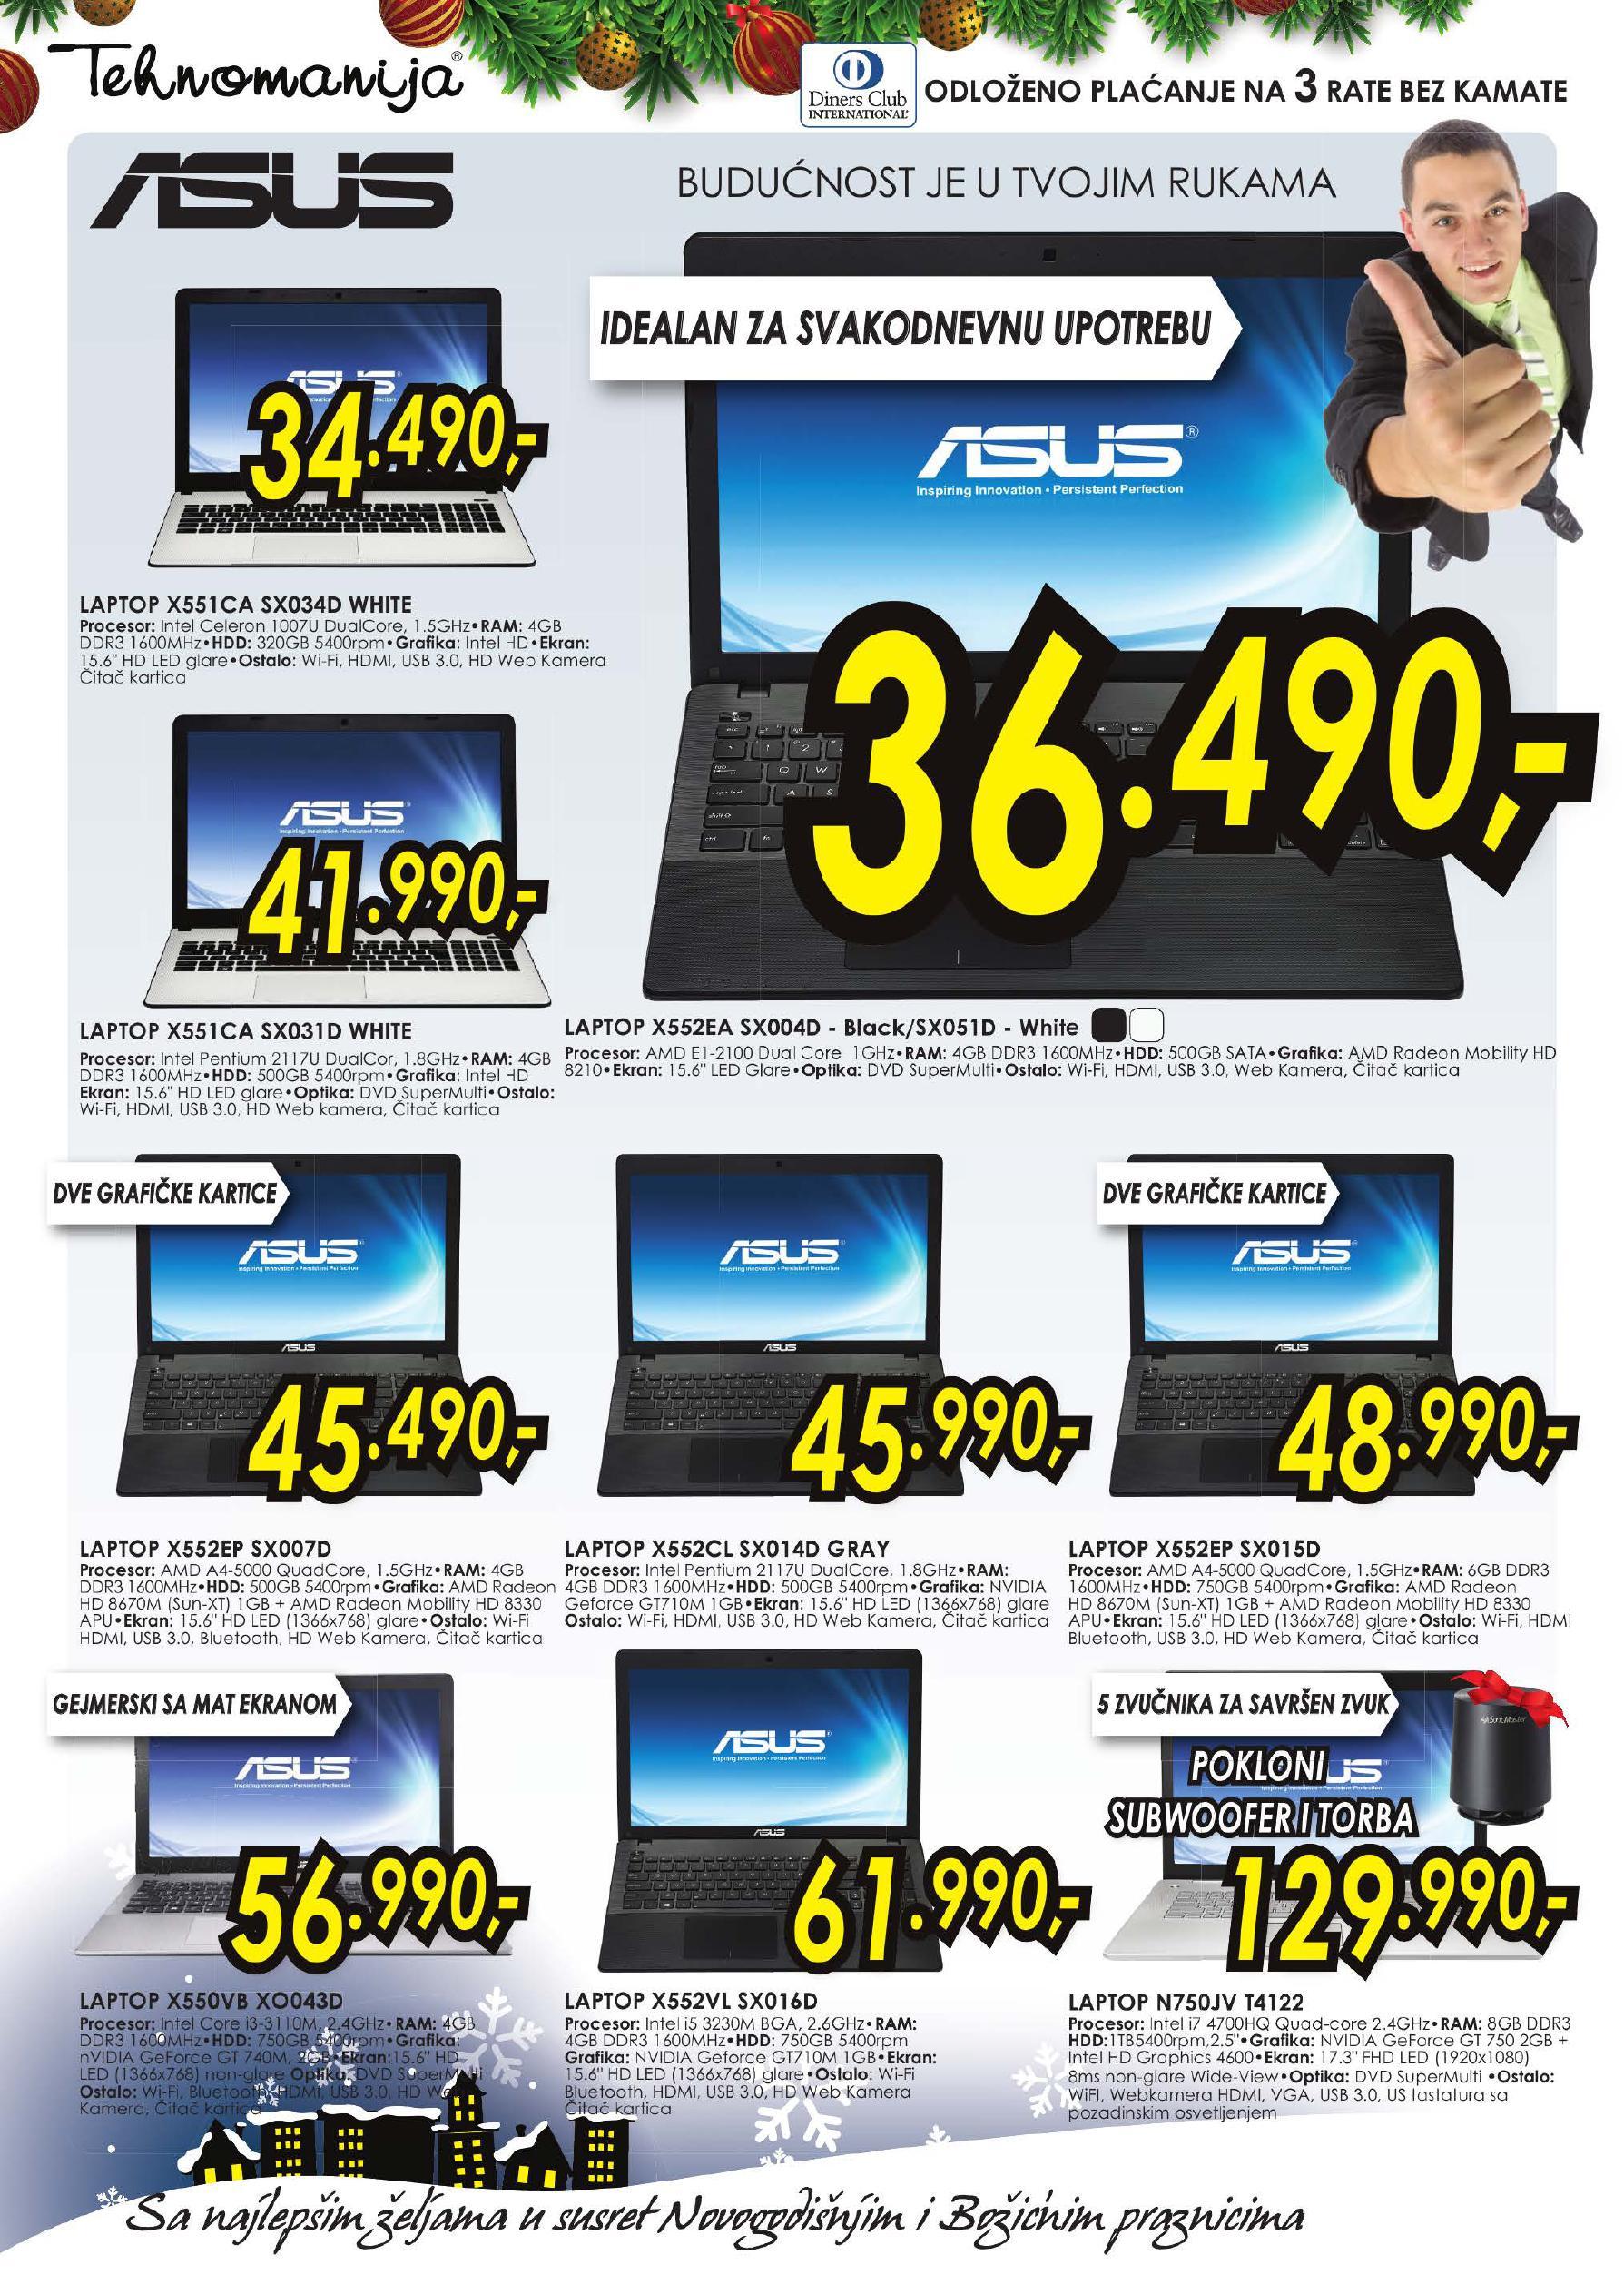 Tehnomanija katalog IT oprema po super ceni